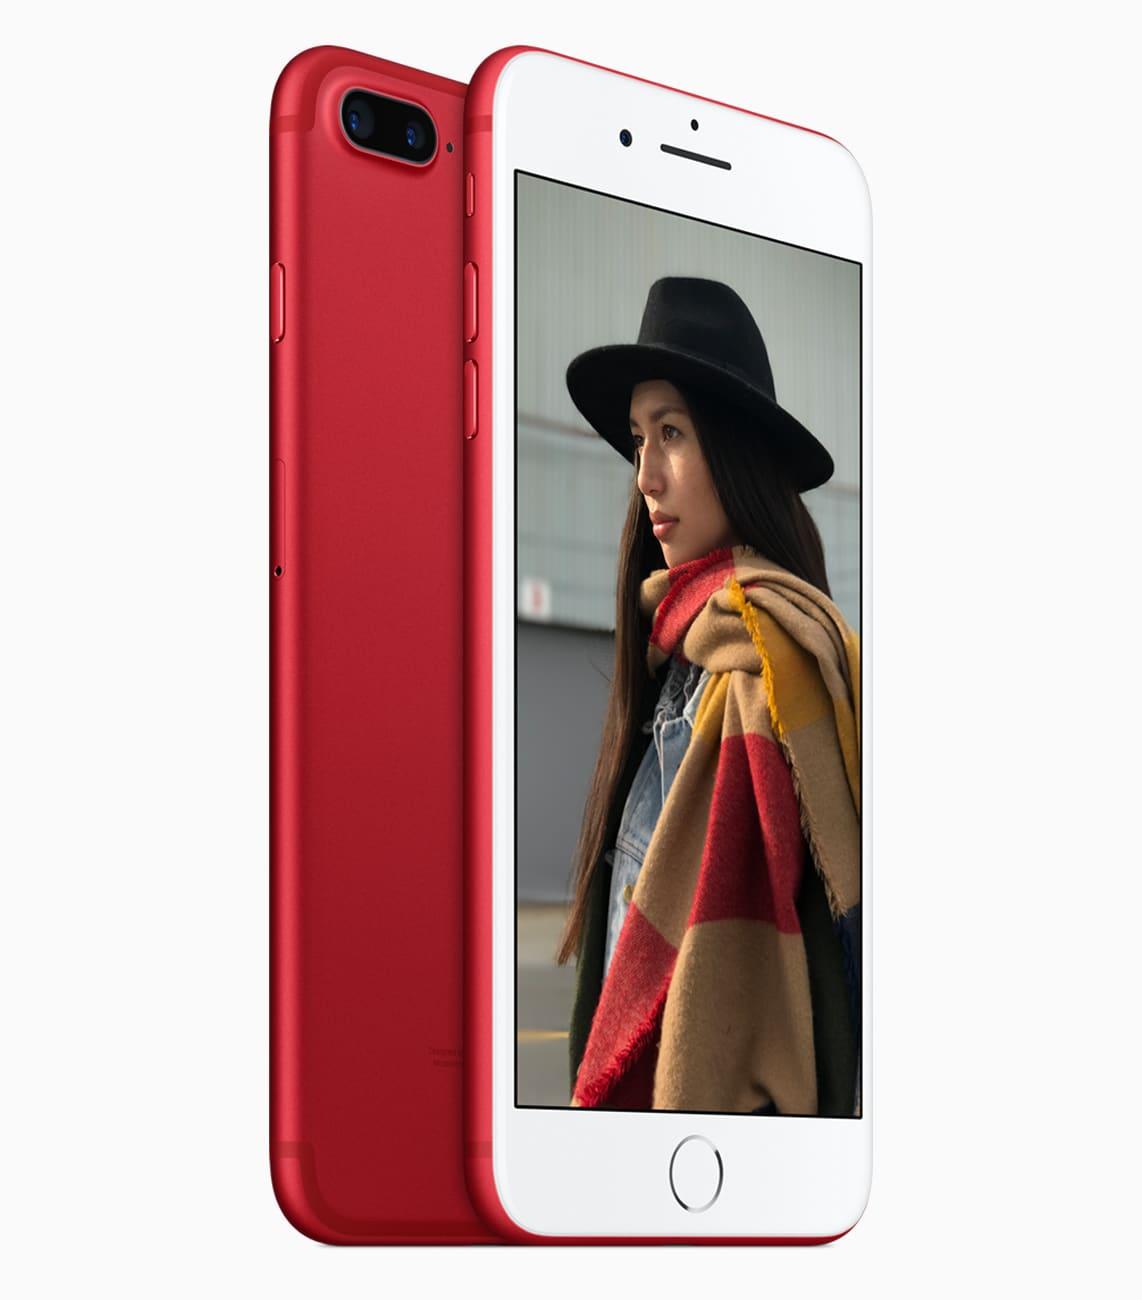 Red phones